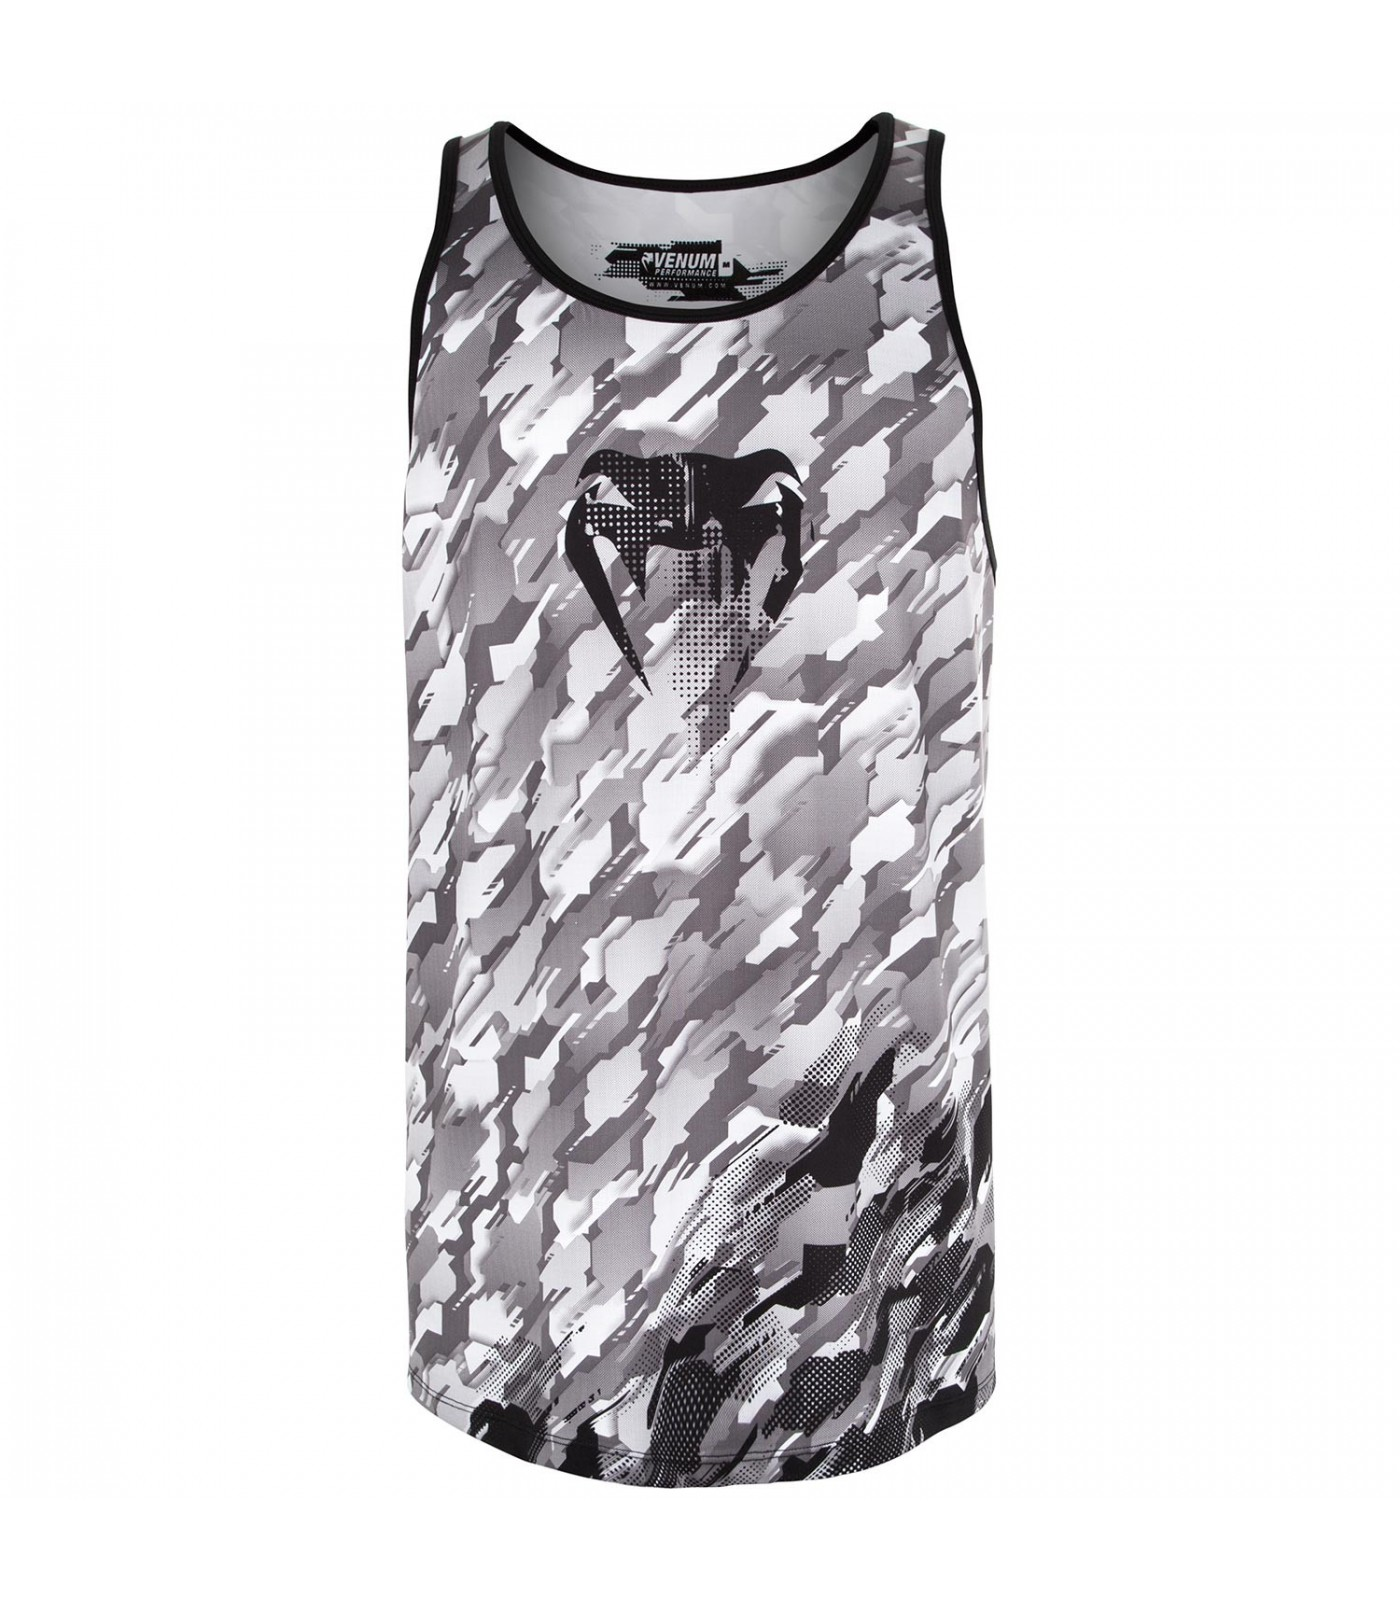 Потник - Venum Tecmo Tank Top - Black/Grey